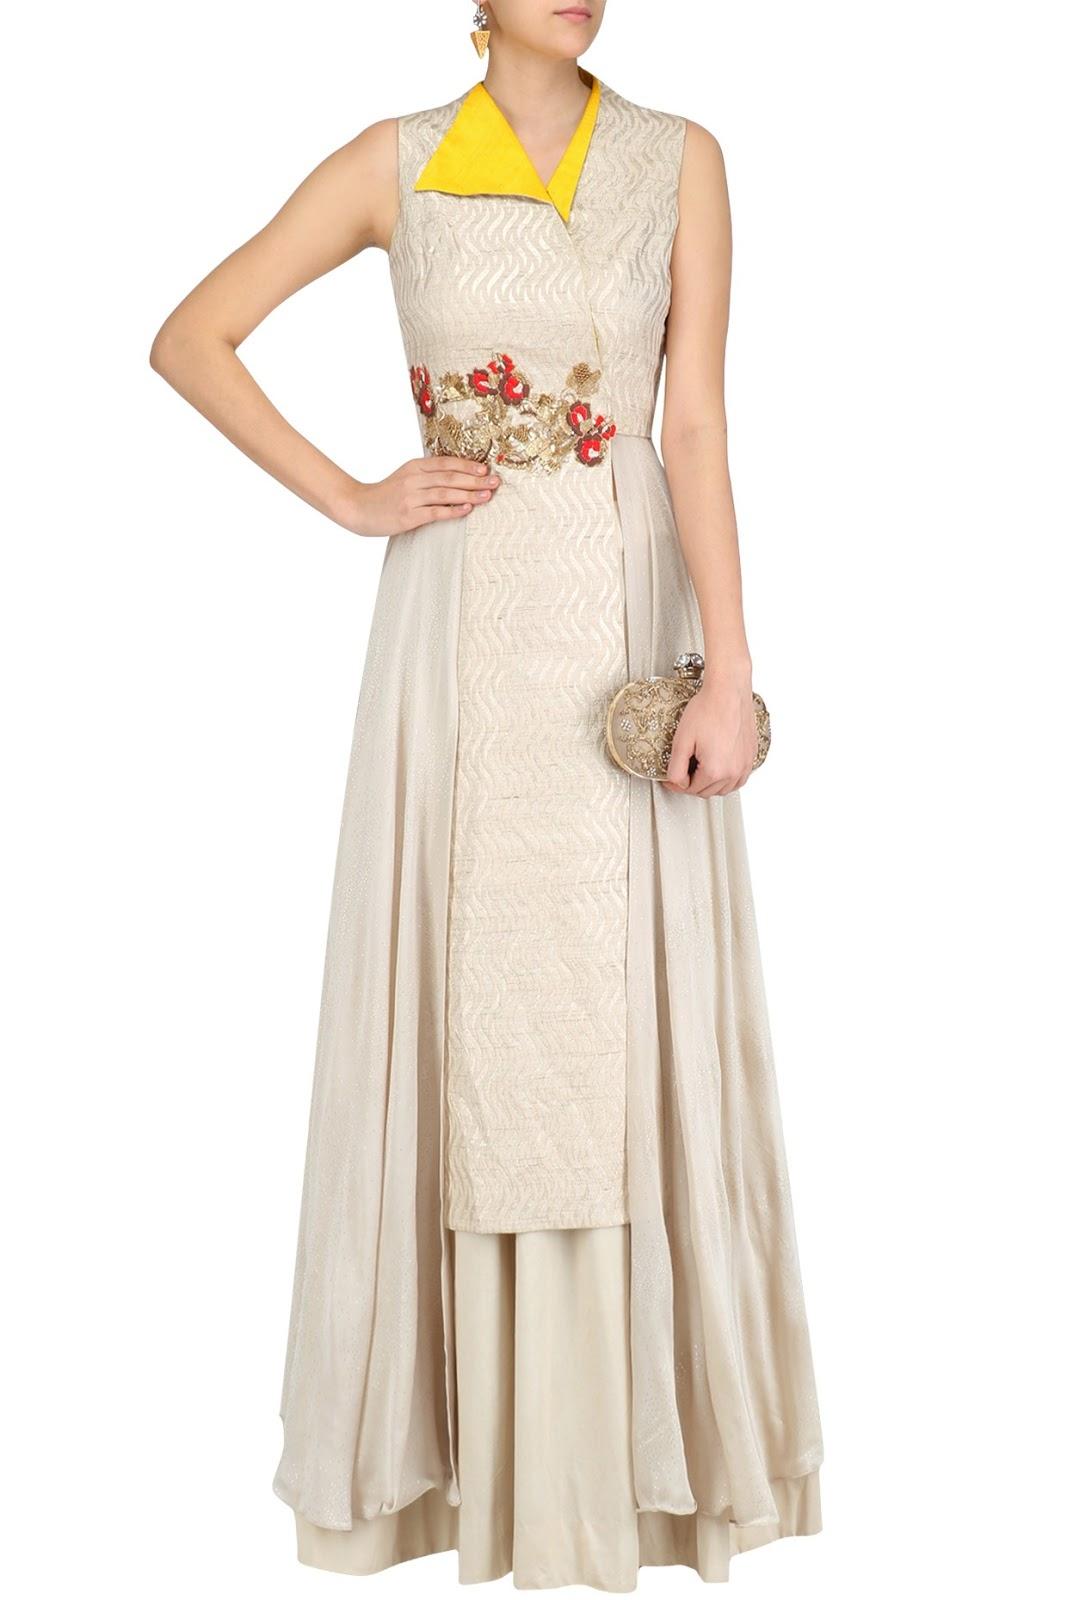 Rishi & Soujit Indo Western Dresses